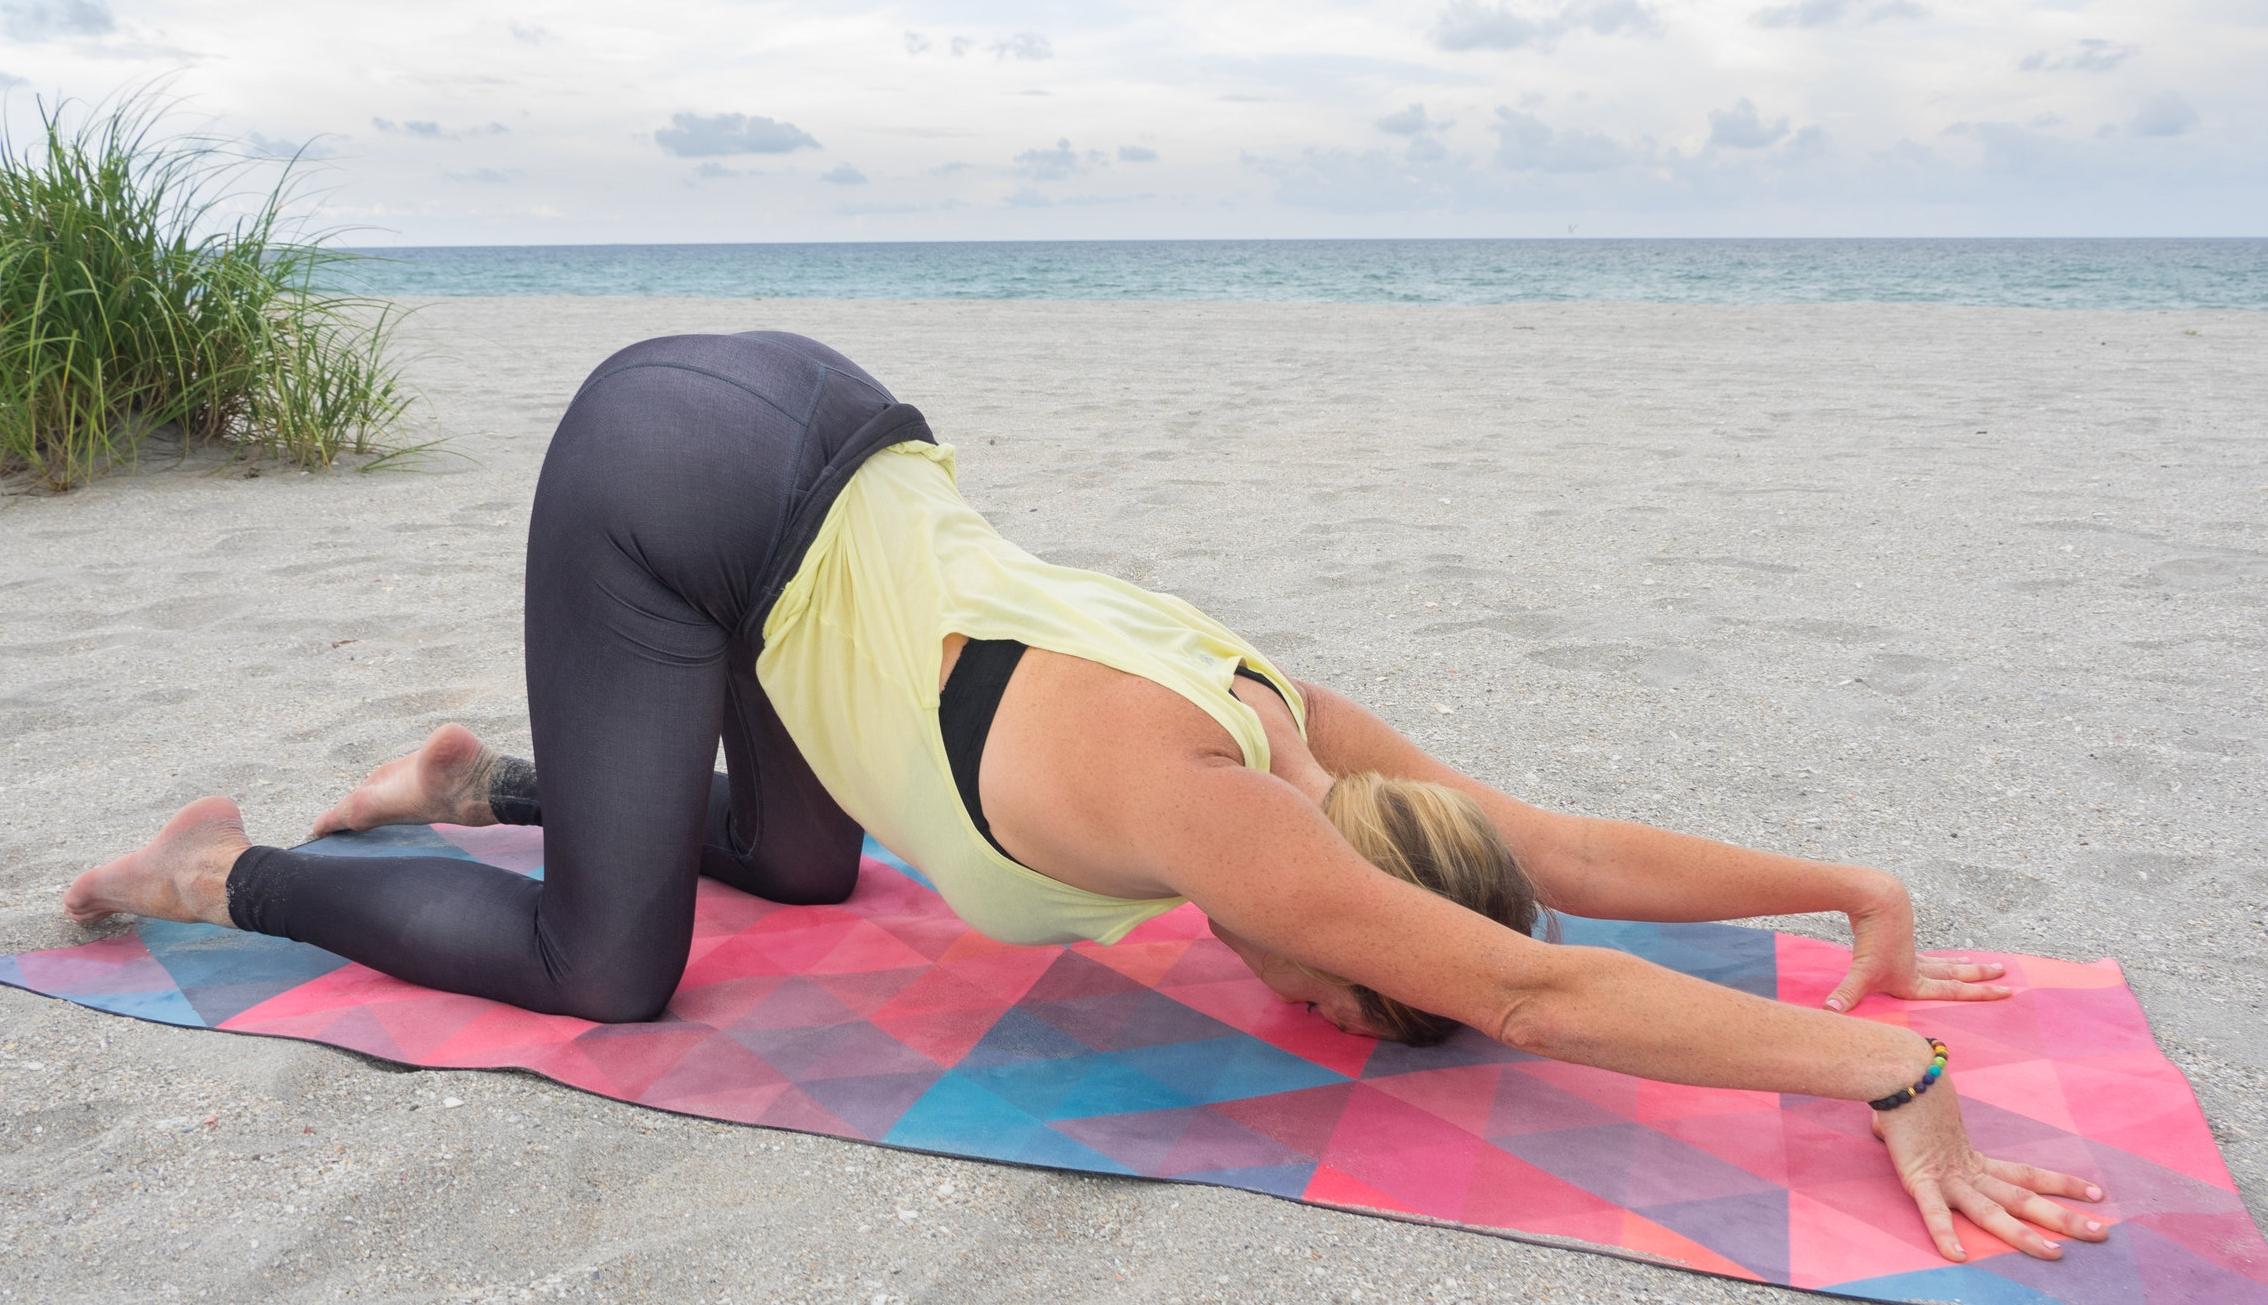 Apparel-->  Lucy Activewear  | Bracelets-->  Jewelry Yoga  | Yoga Mat-->  Zura Yoga